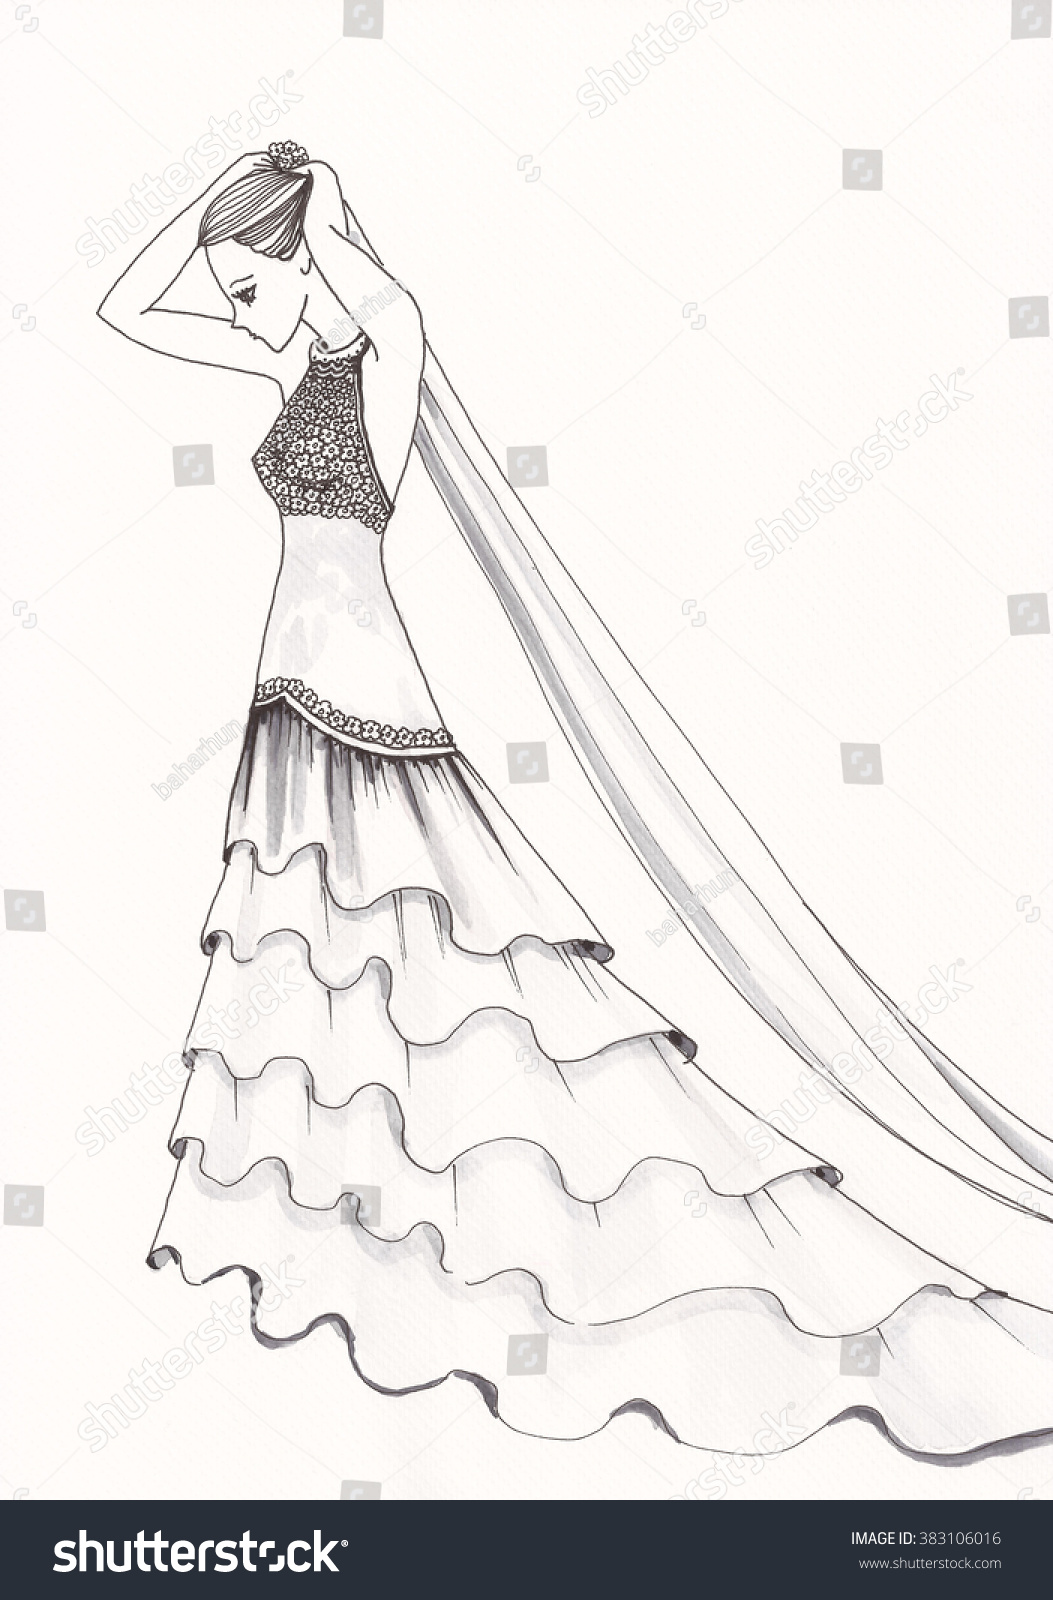 Bride wearing dress pencil drawing black lines